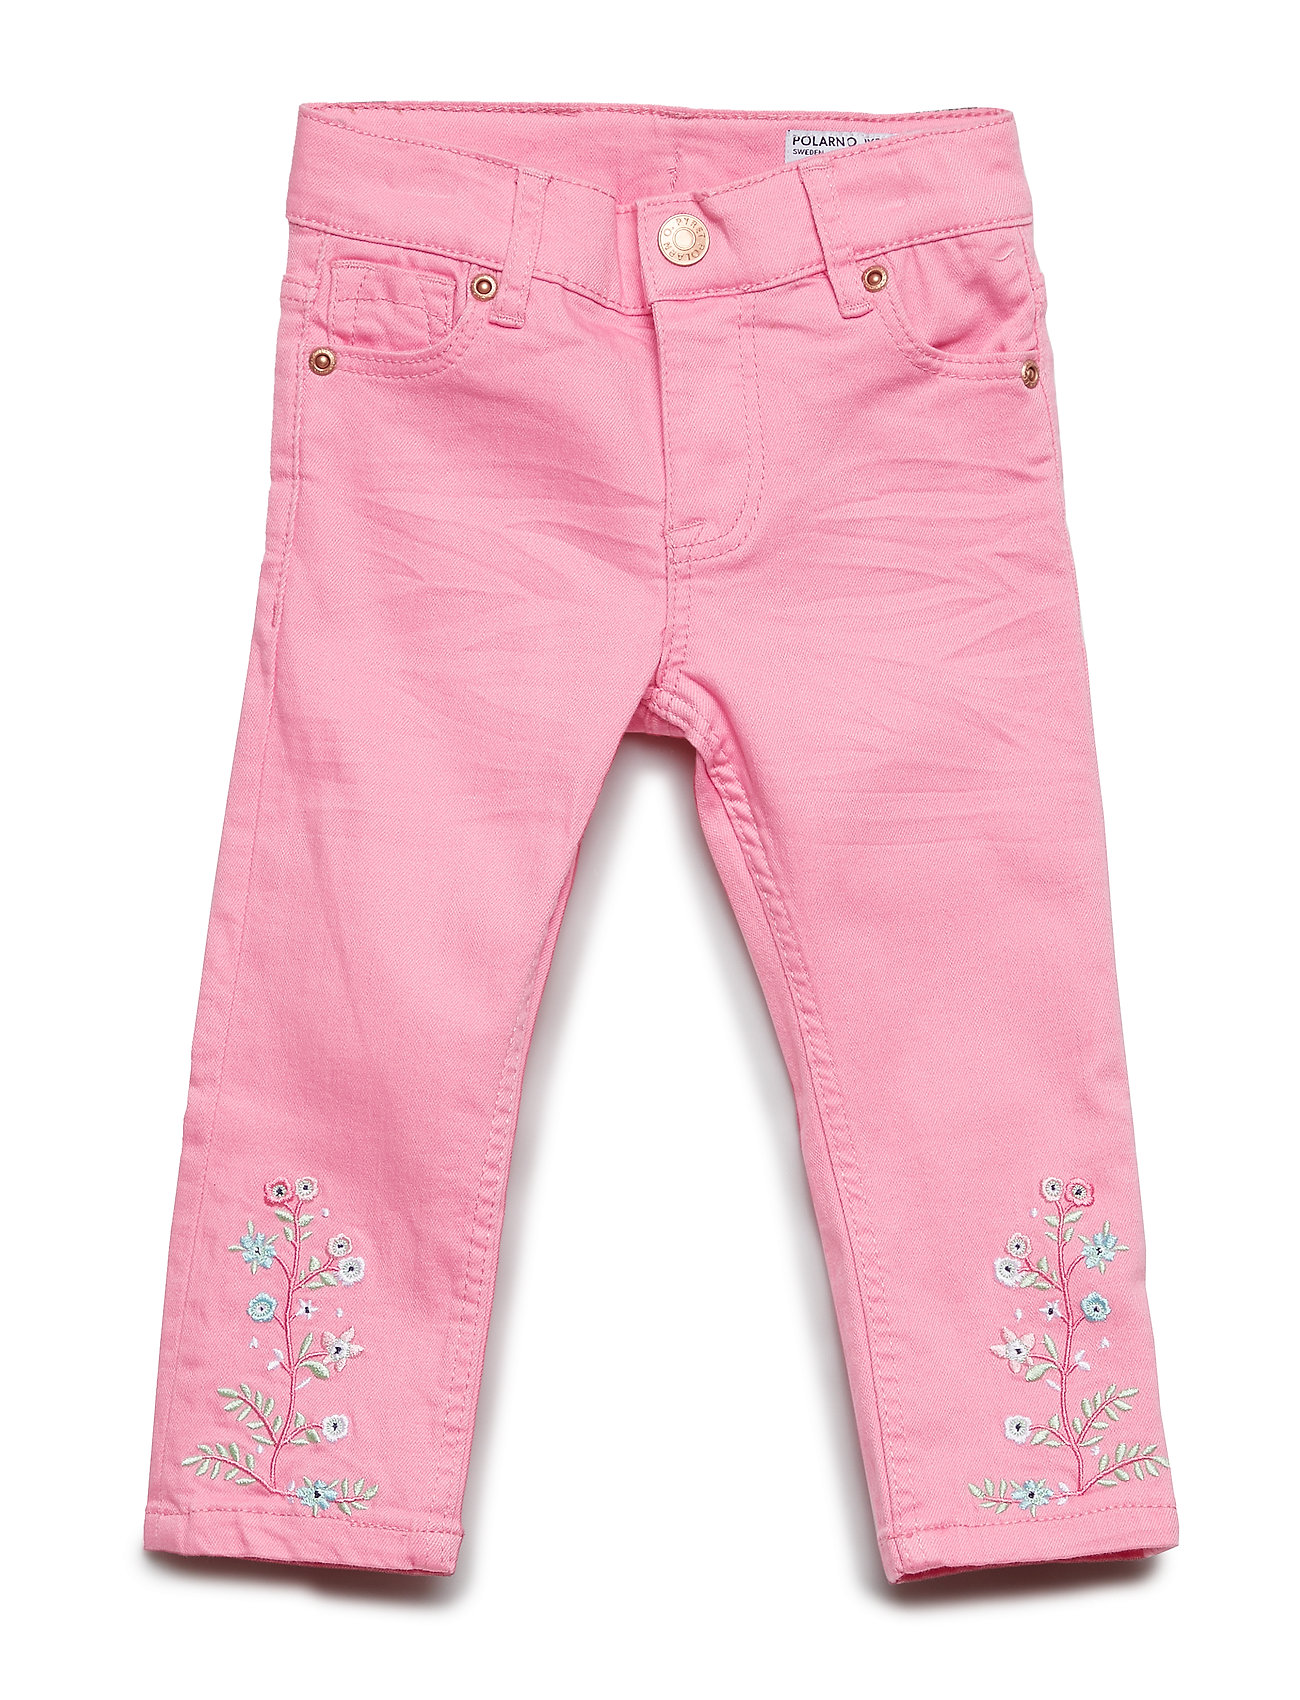 Polarn O. Pyret Trousers Woven Embroidery Preschool - SACHET PINK